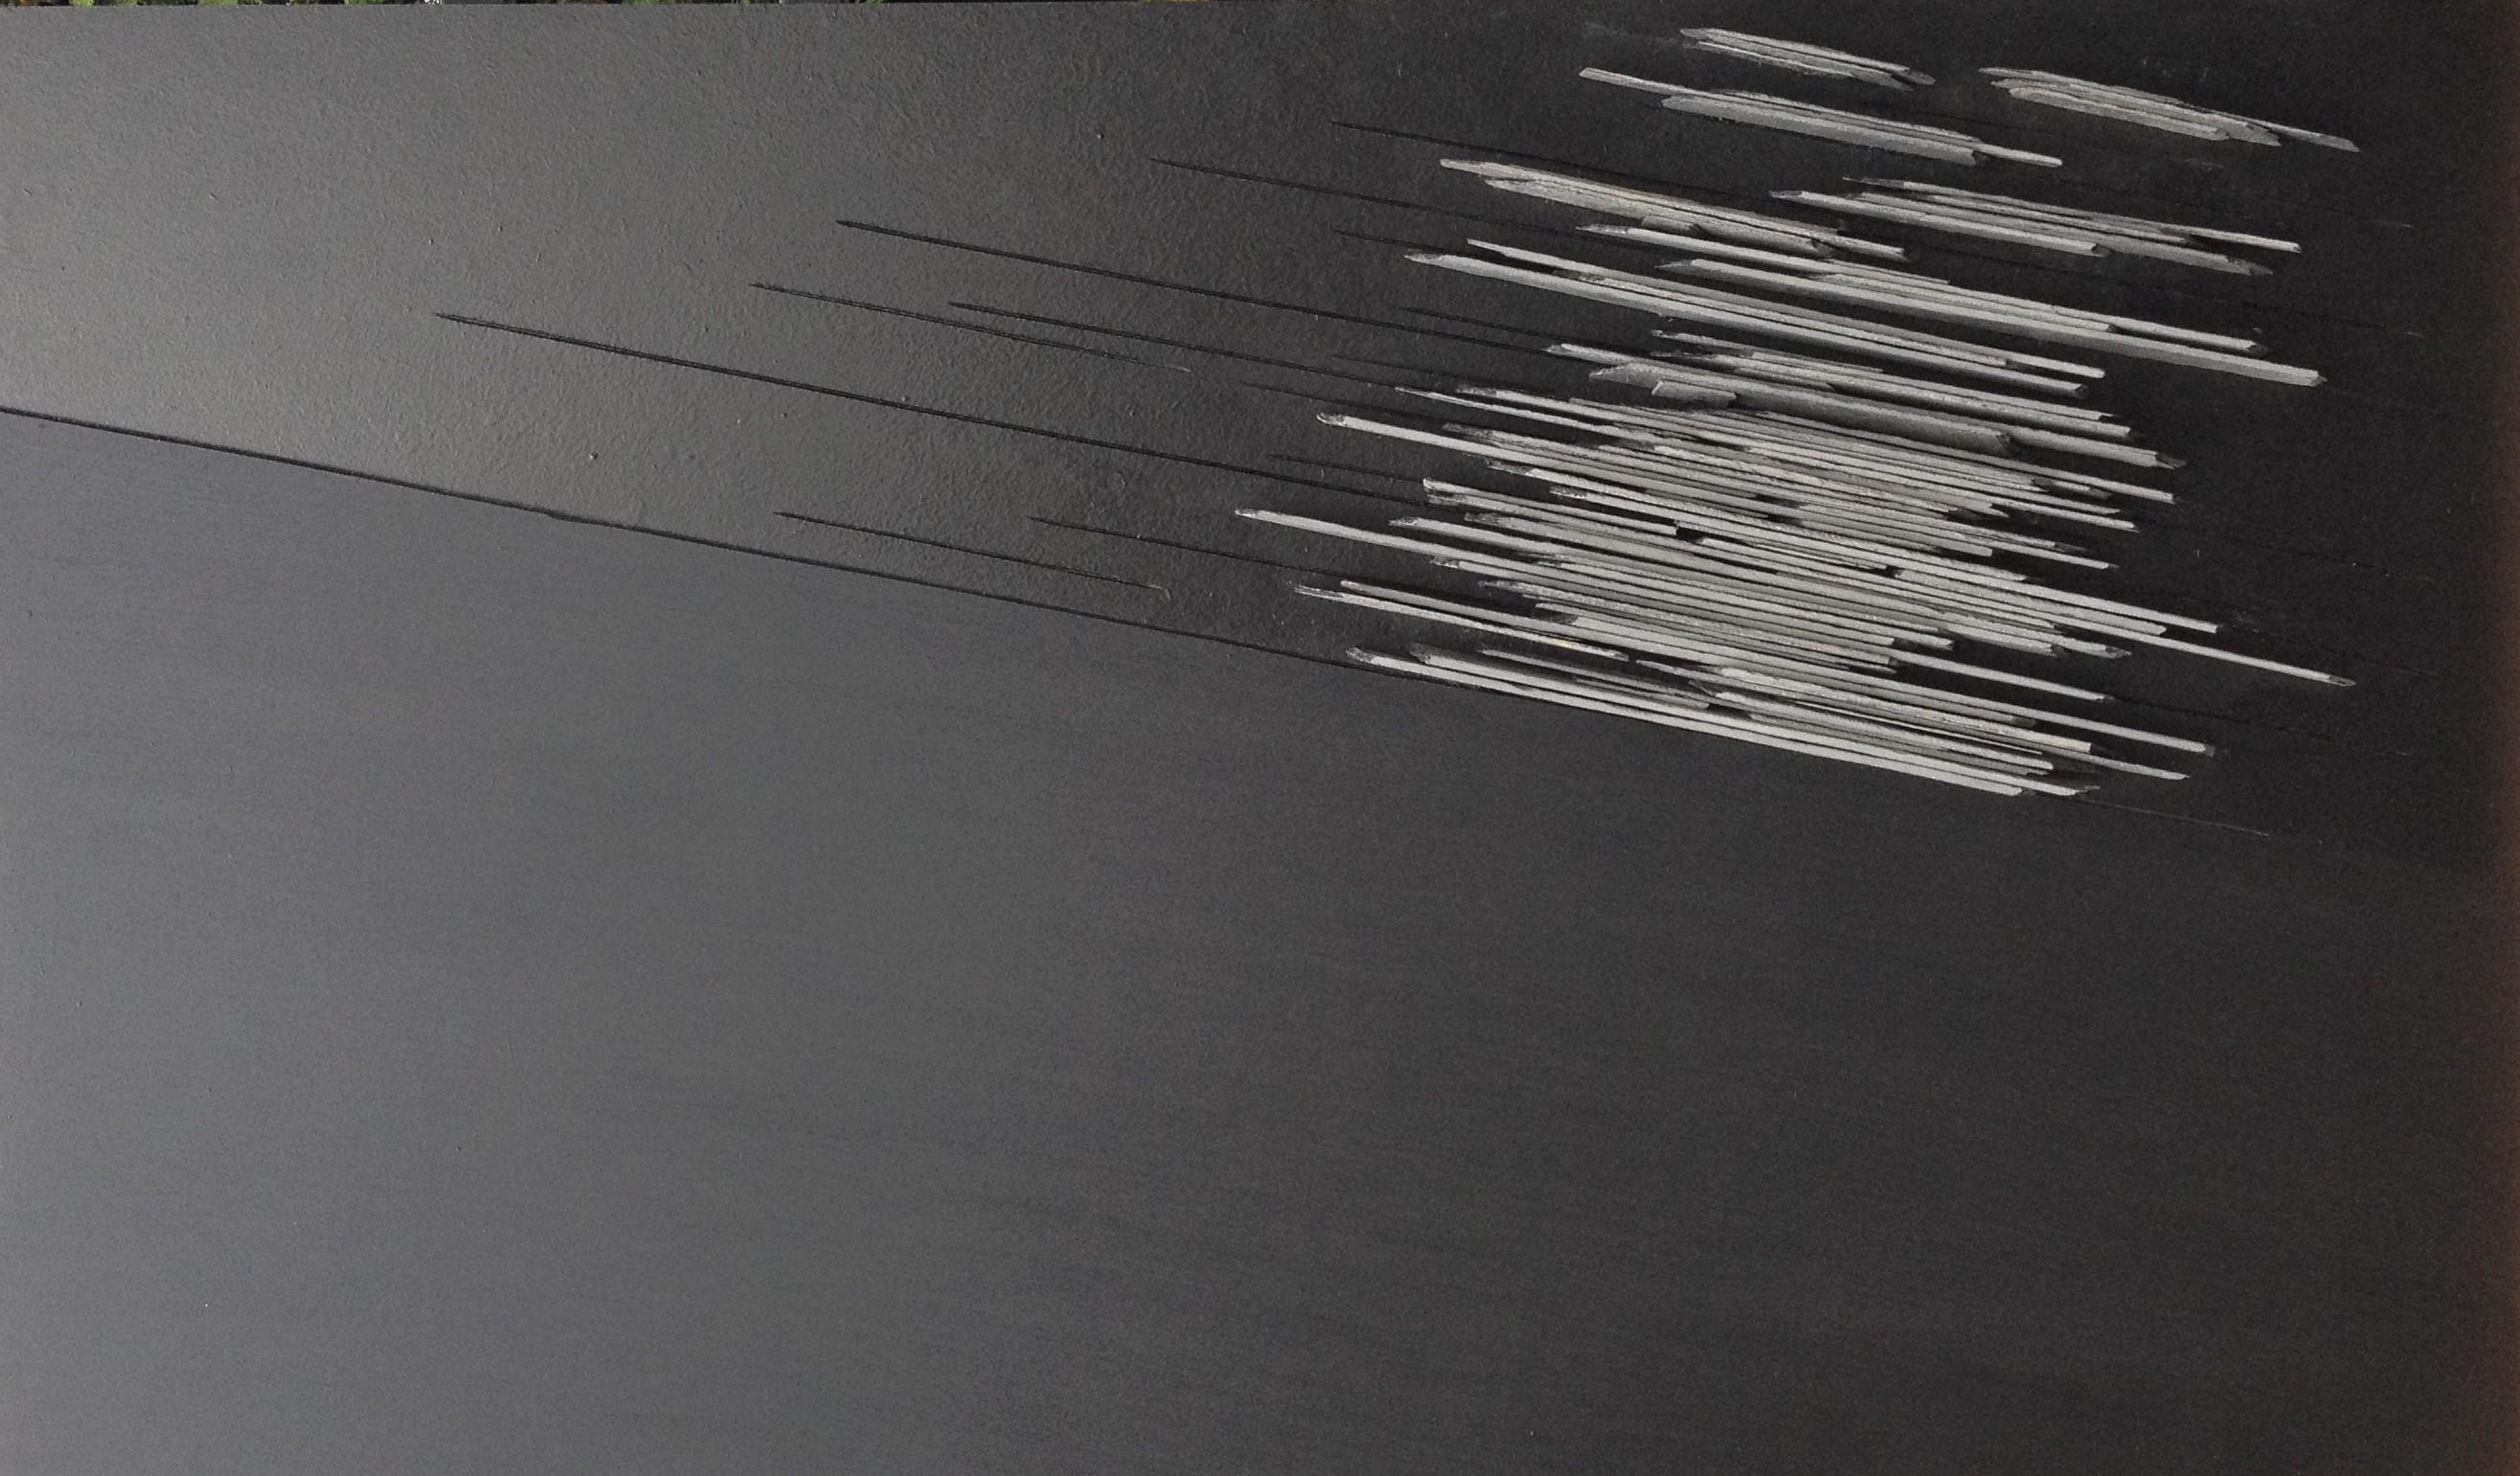 Sezny Peron - Souffle - 70x120 - Ardoises et bois